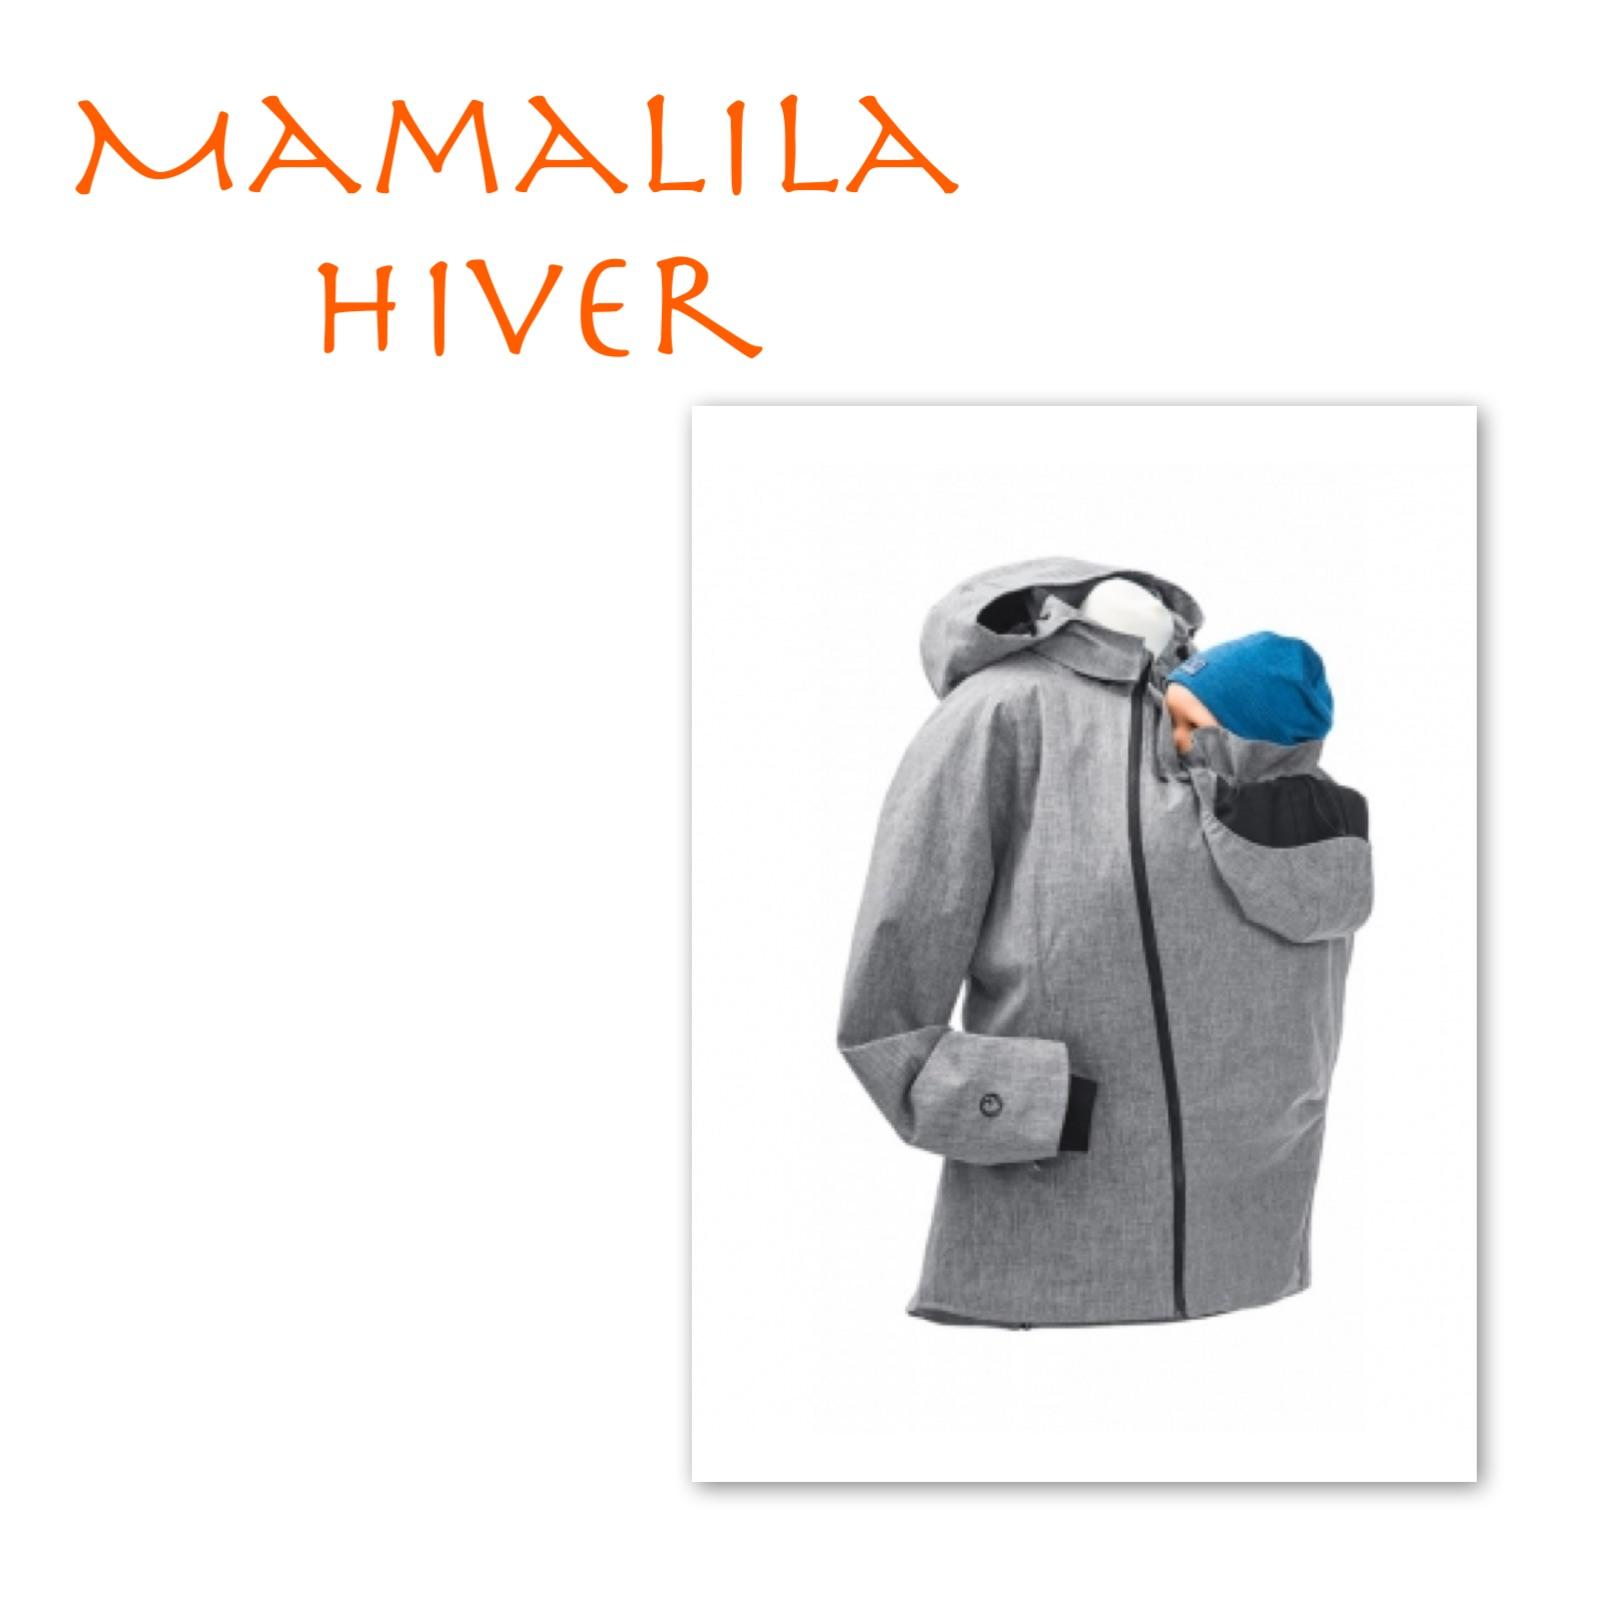 Mamalila hiver